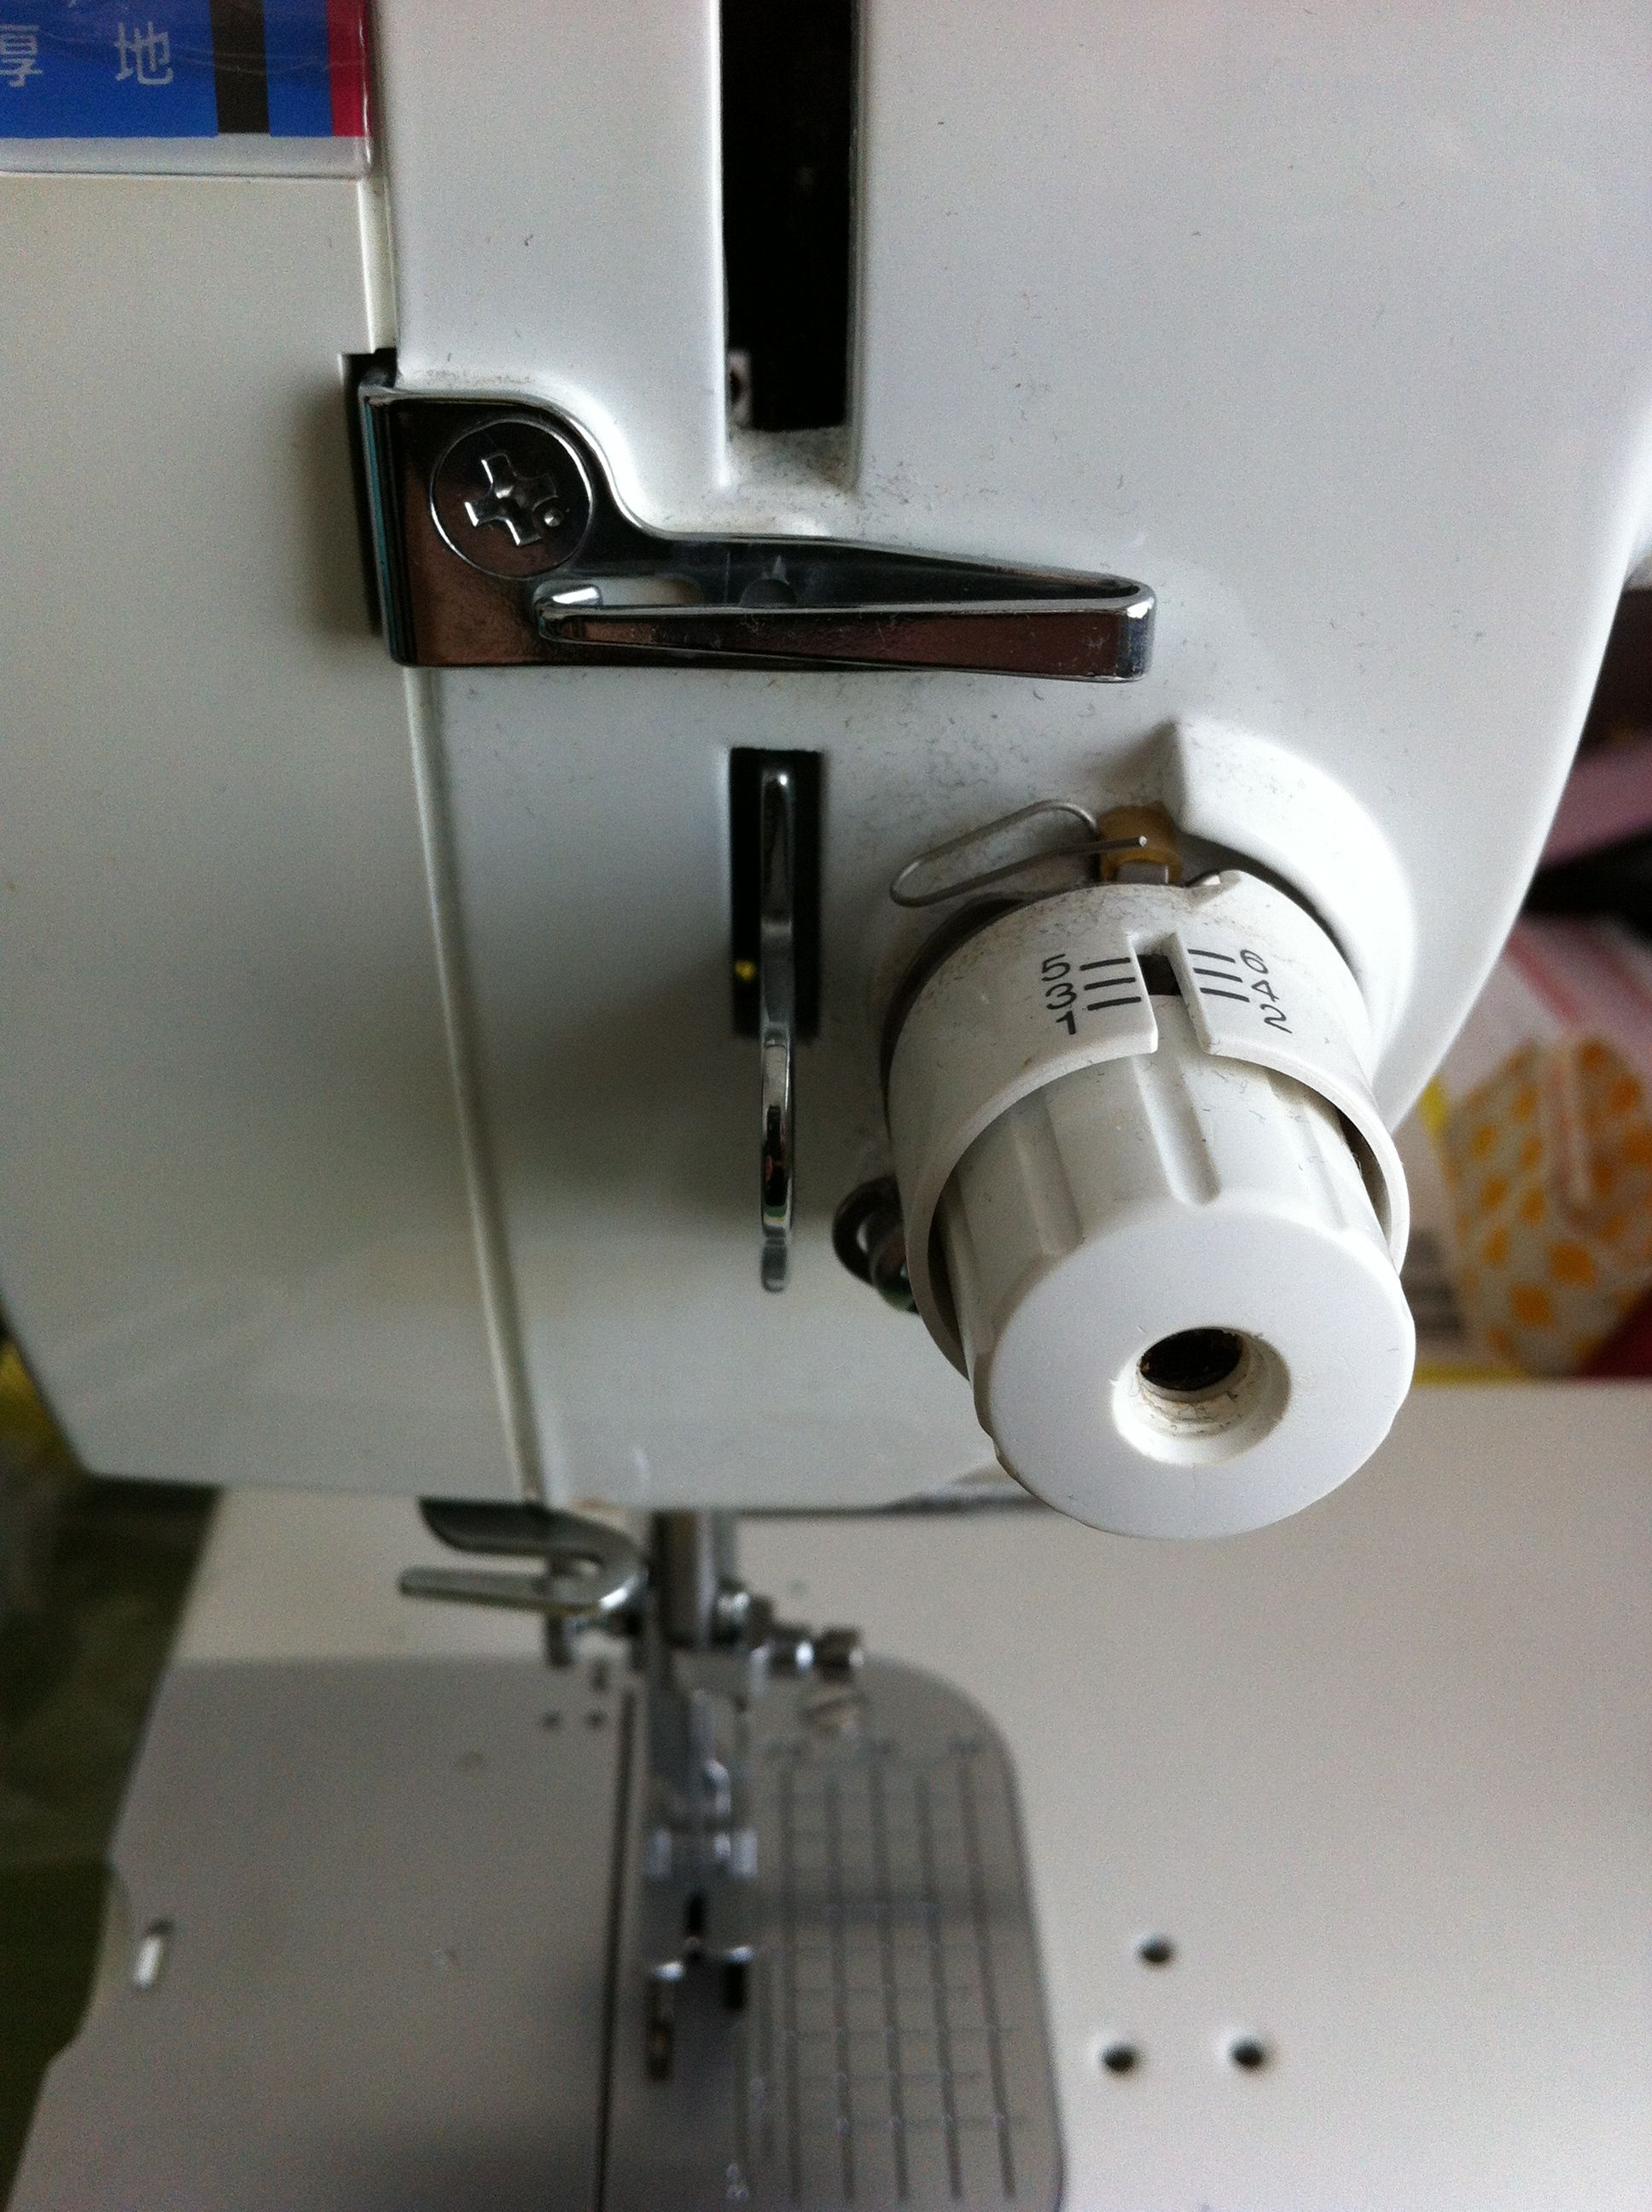 太糸使用時の糸調子